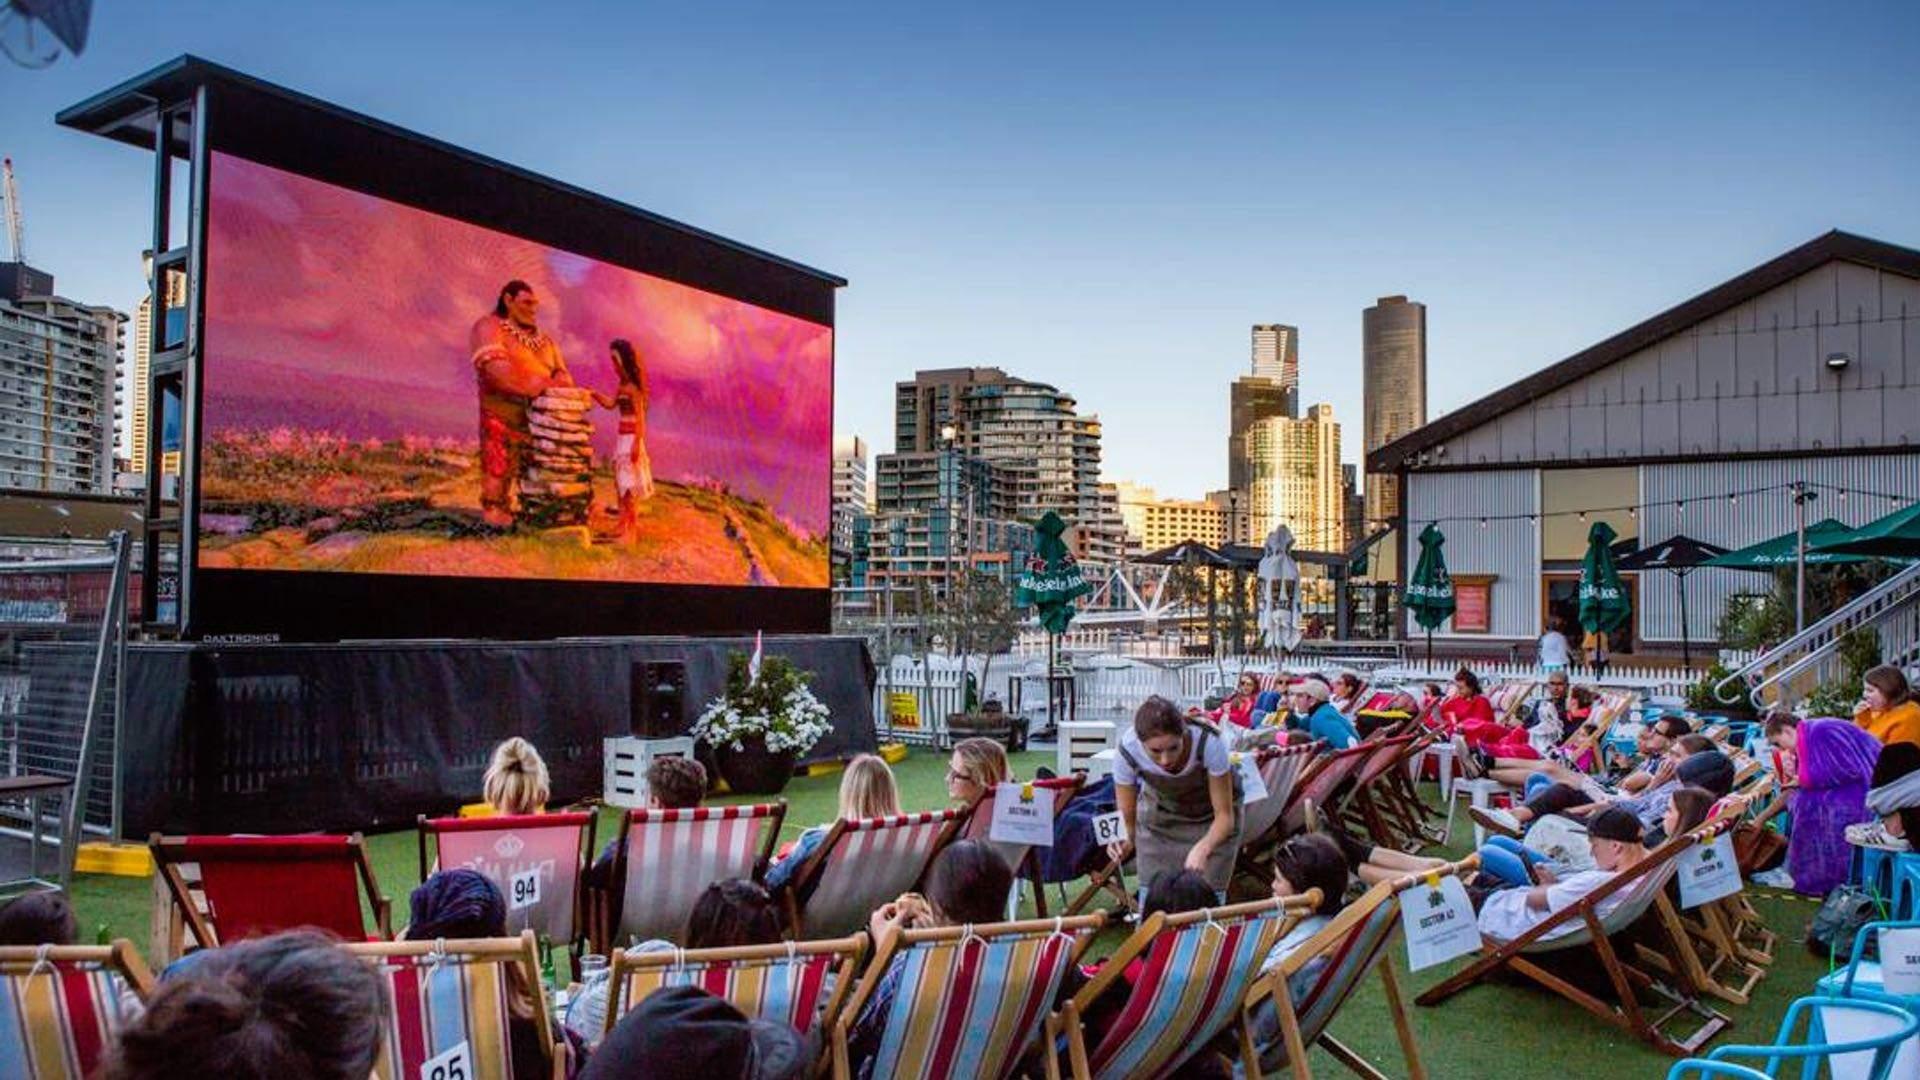 South Wharf Pop-Up Cinema 2019